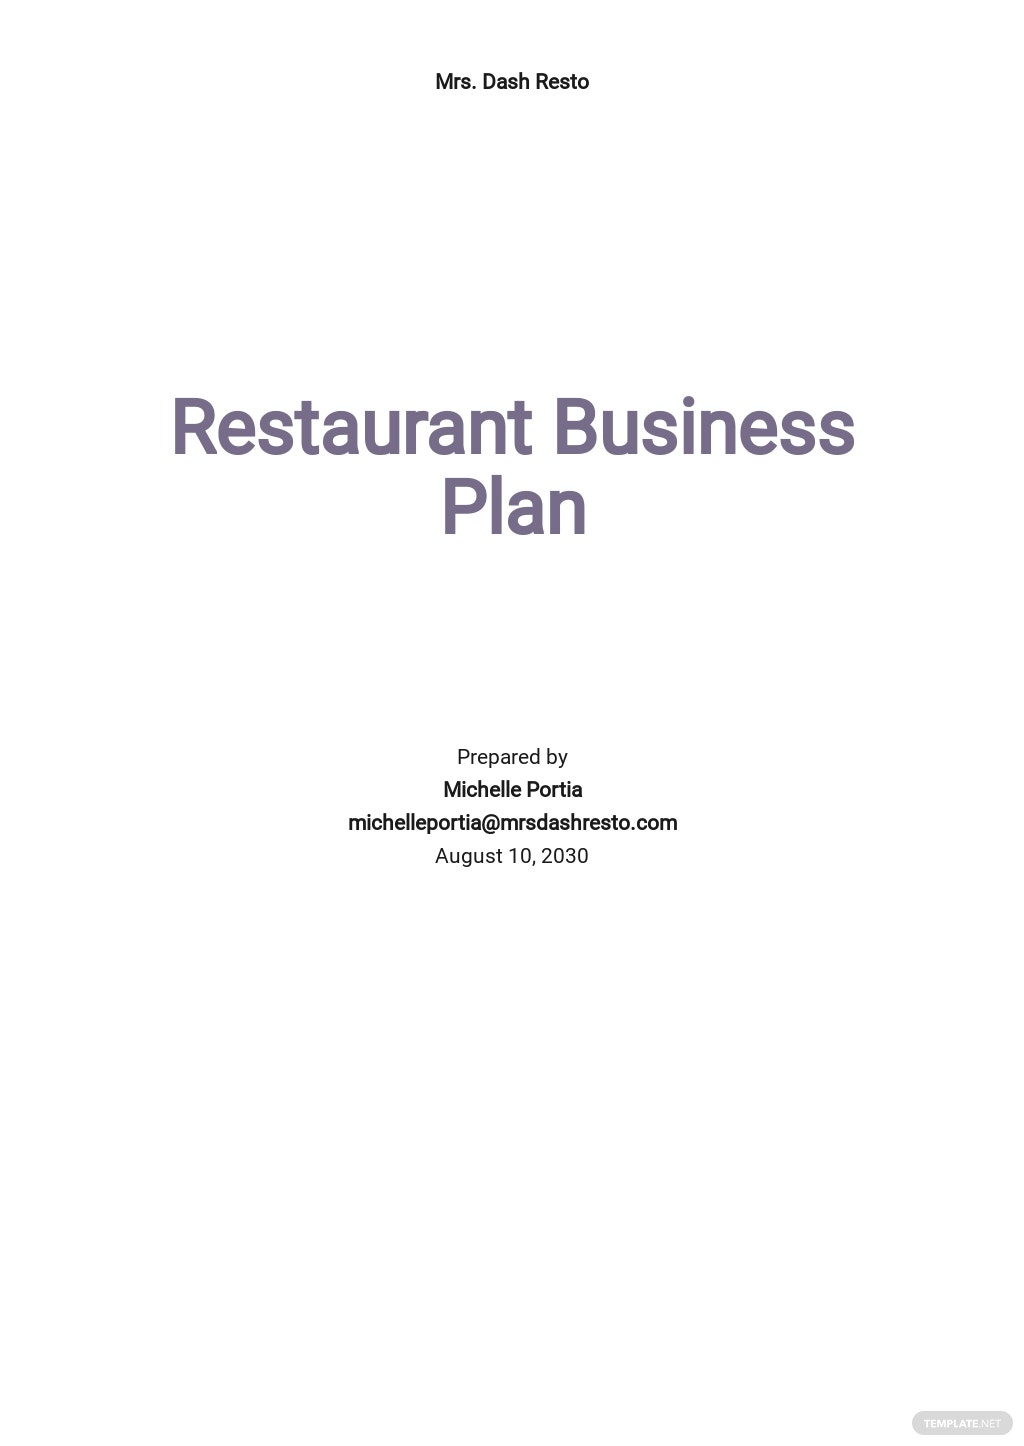 Restaurant Business Plan Outline Template.jpe